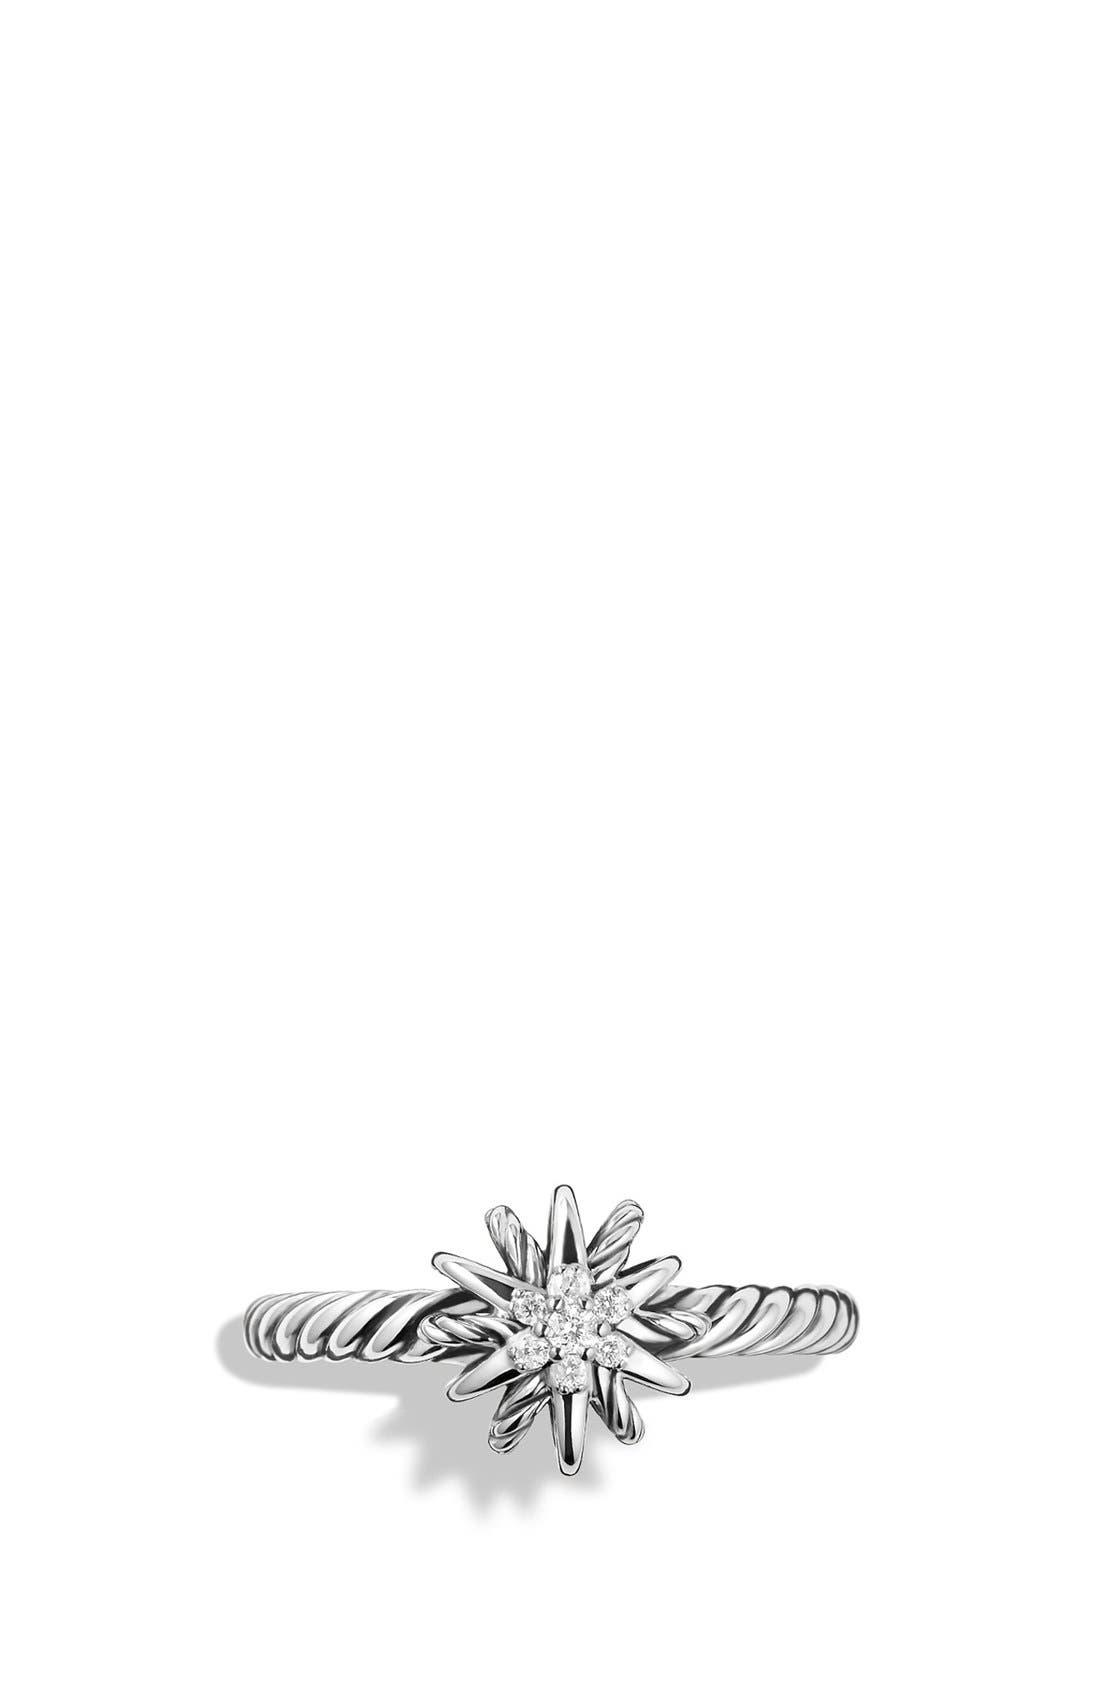 'Starburst' Ring with Diamonds,                             Alternate thumbnail 3, color,                             DIAMOND